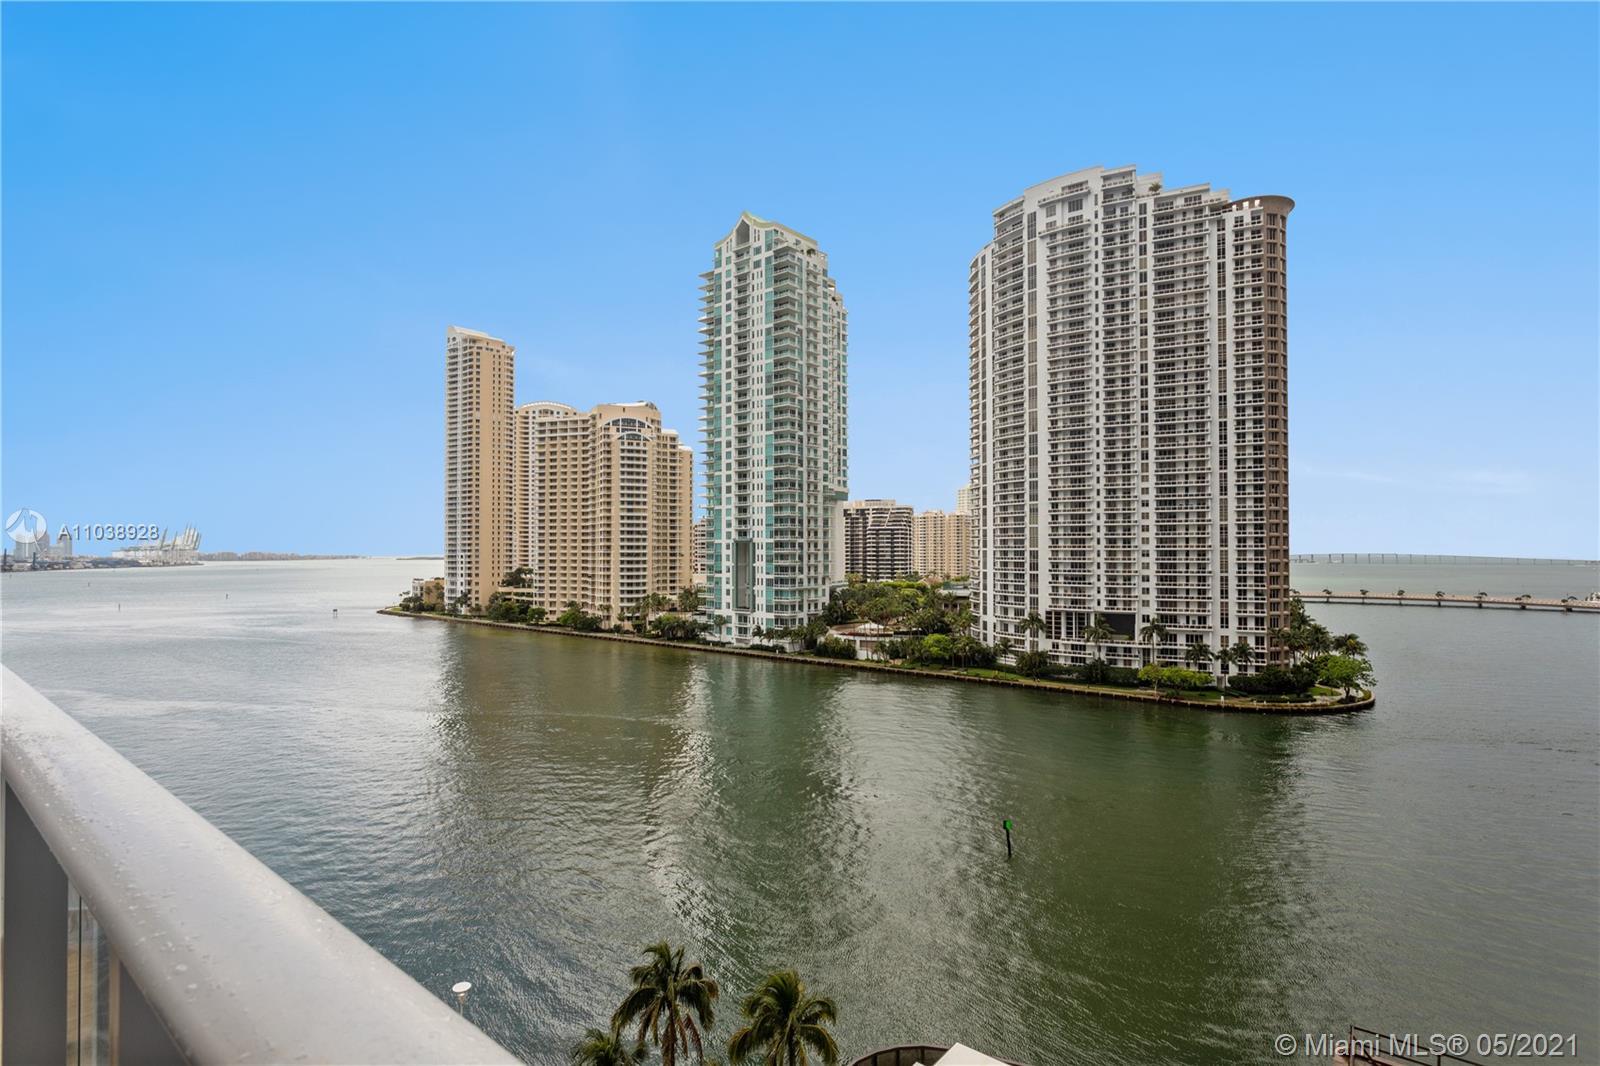 Met 1 #L-1012 - 300 S Biscayne Blvd #L-1012, Miami, FL 33131